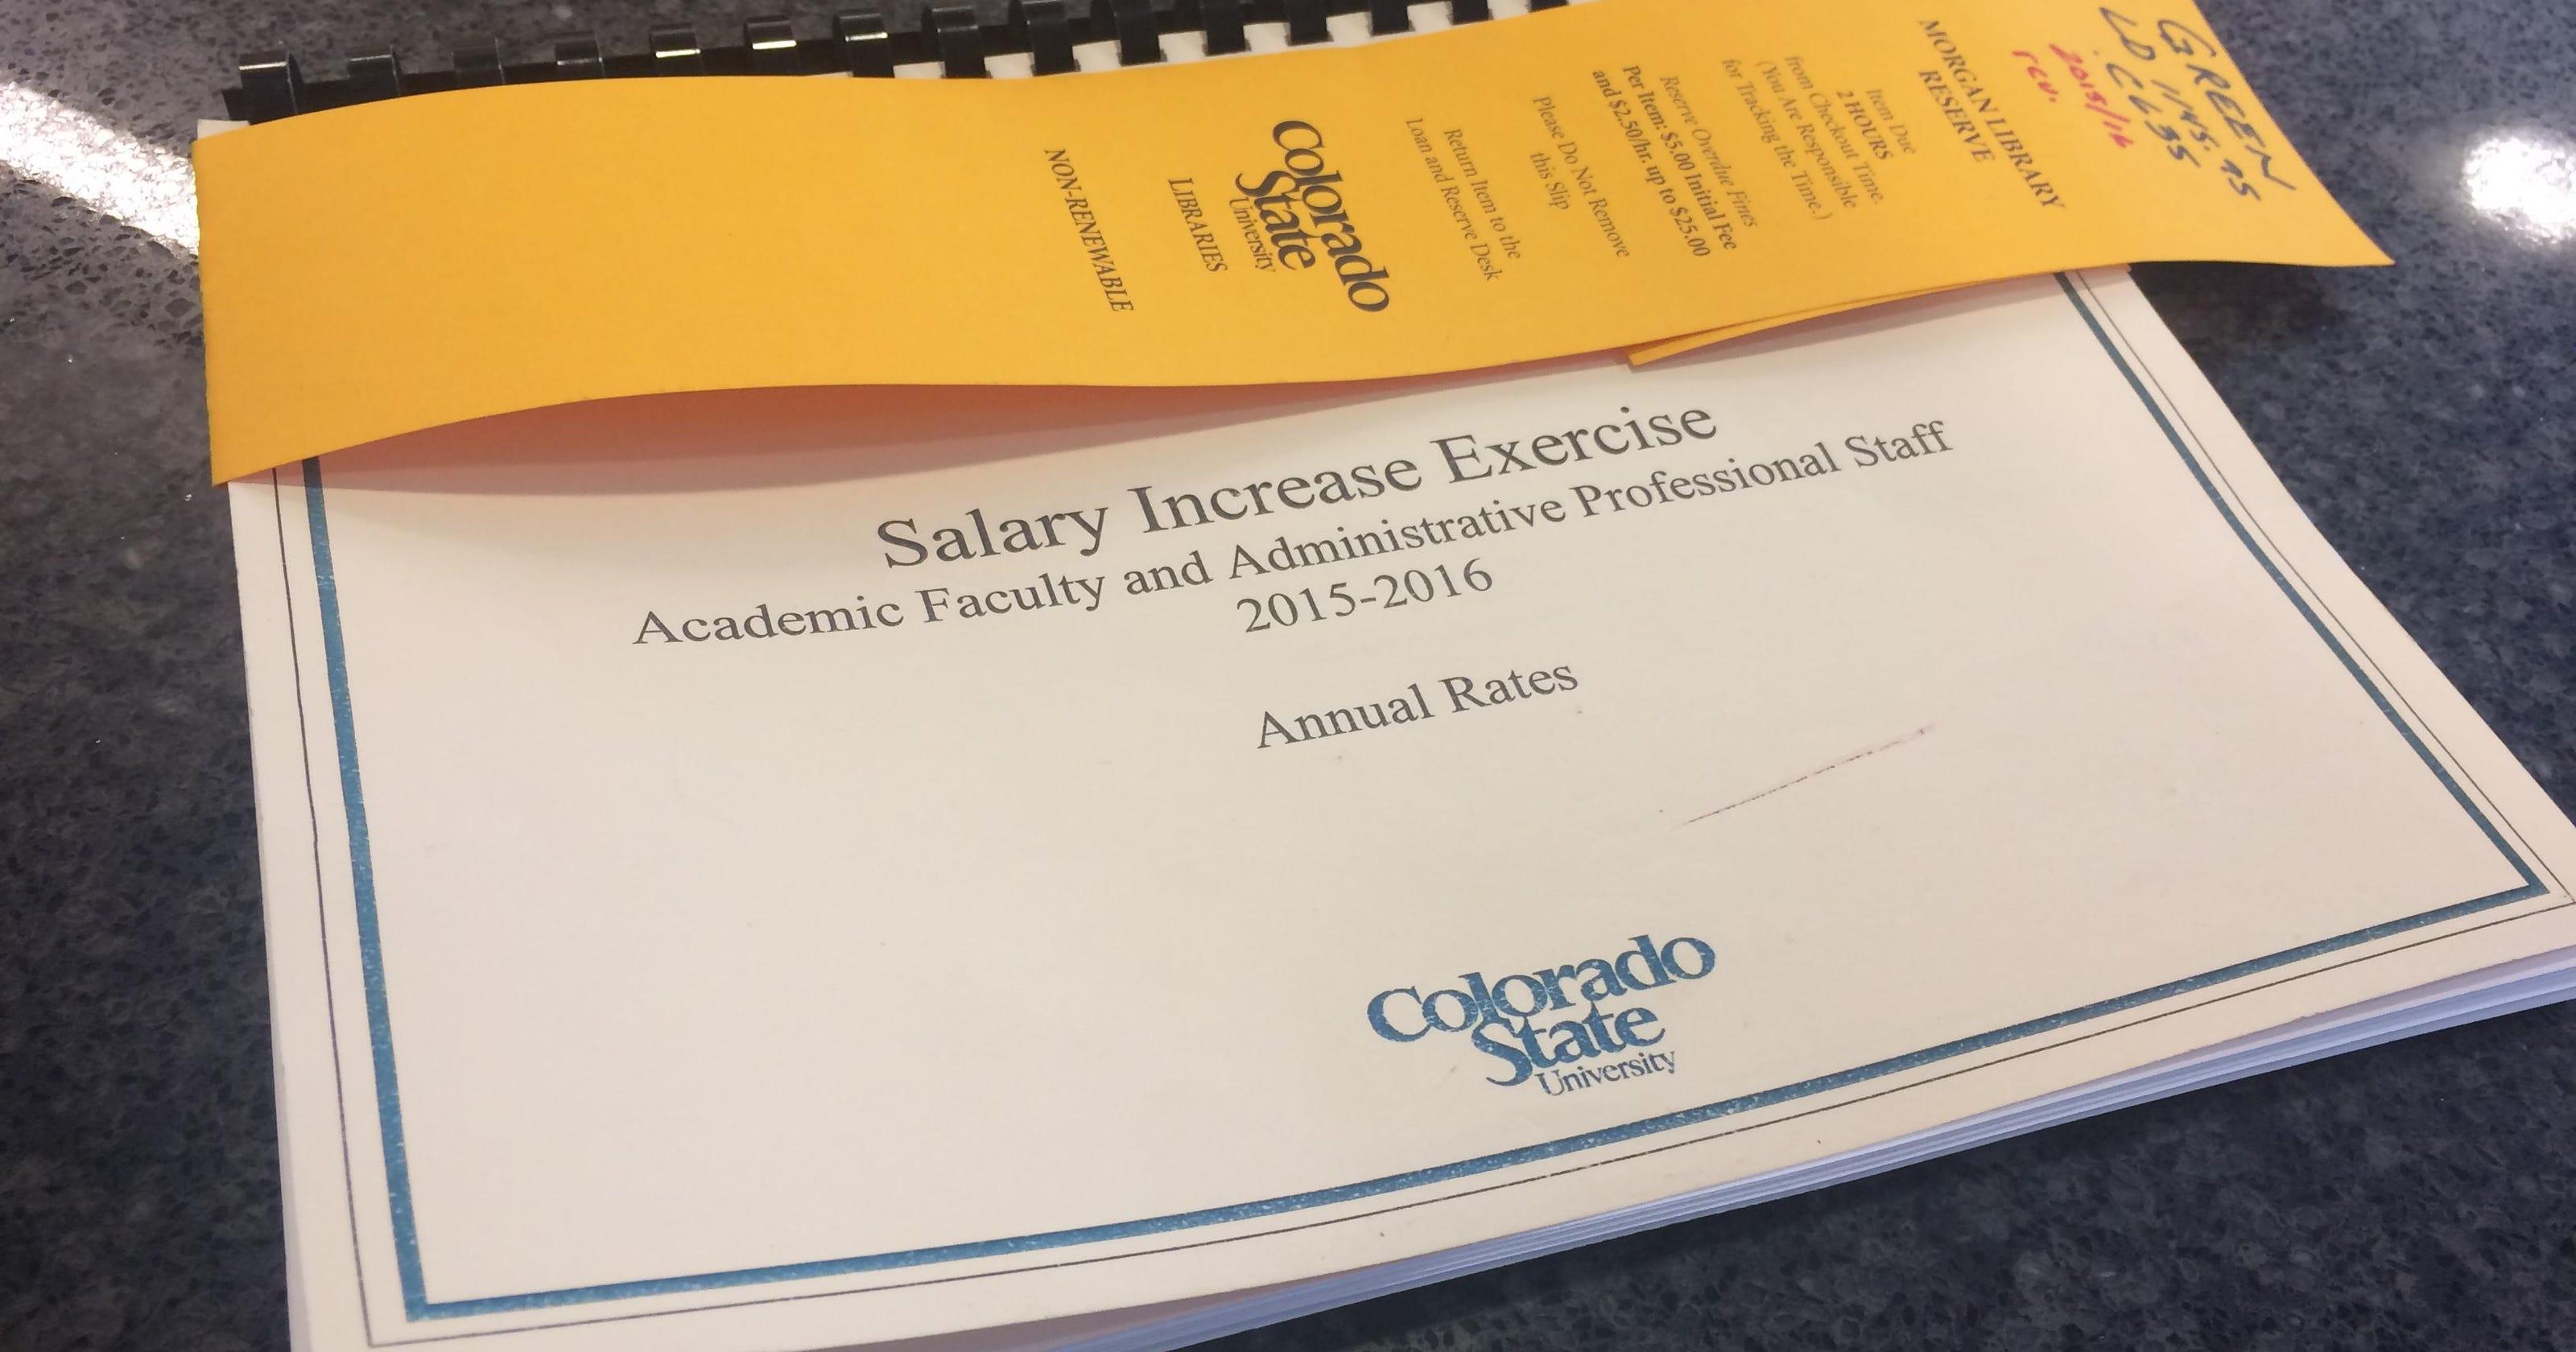 How we did it: Digitizing CSU's salary increase exercise